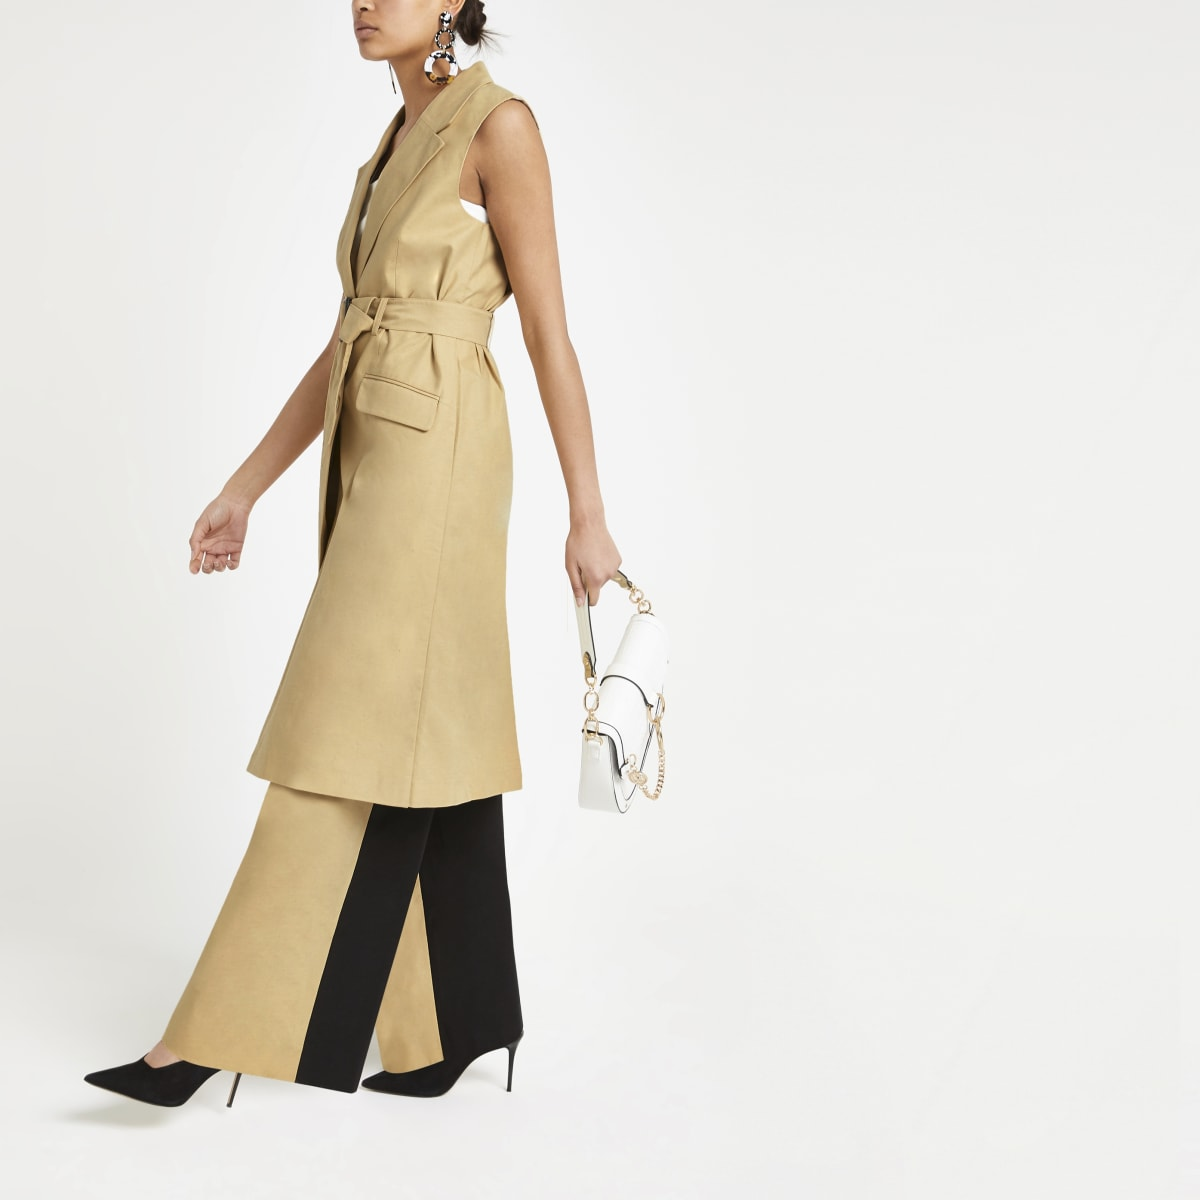 Light brown sleeveless trench coat